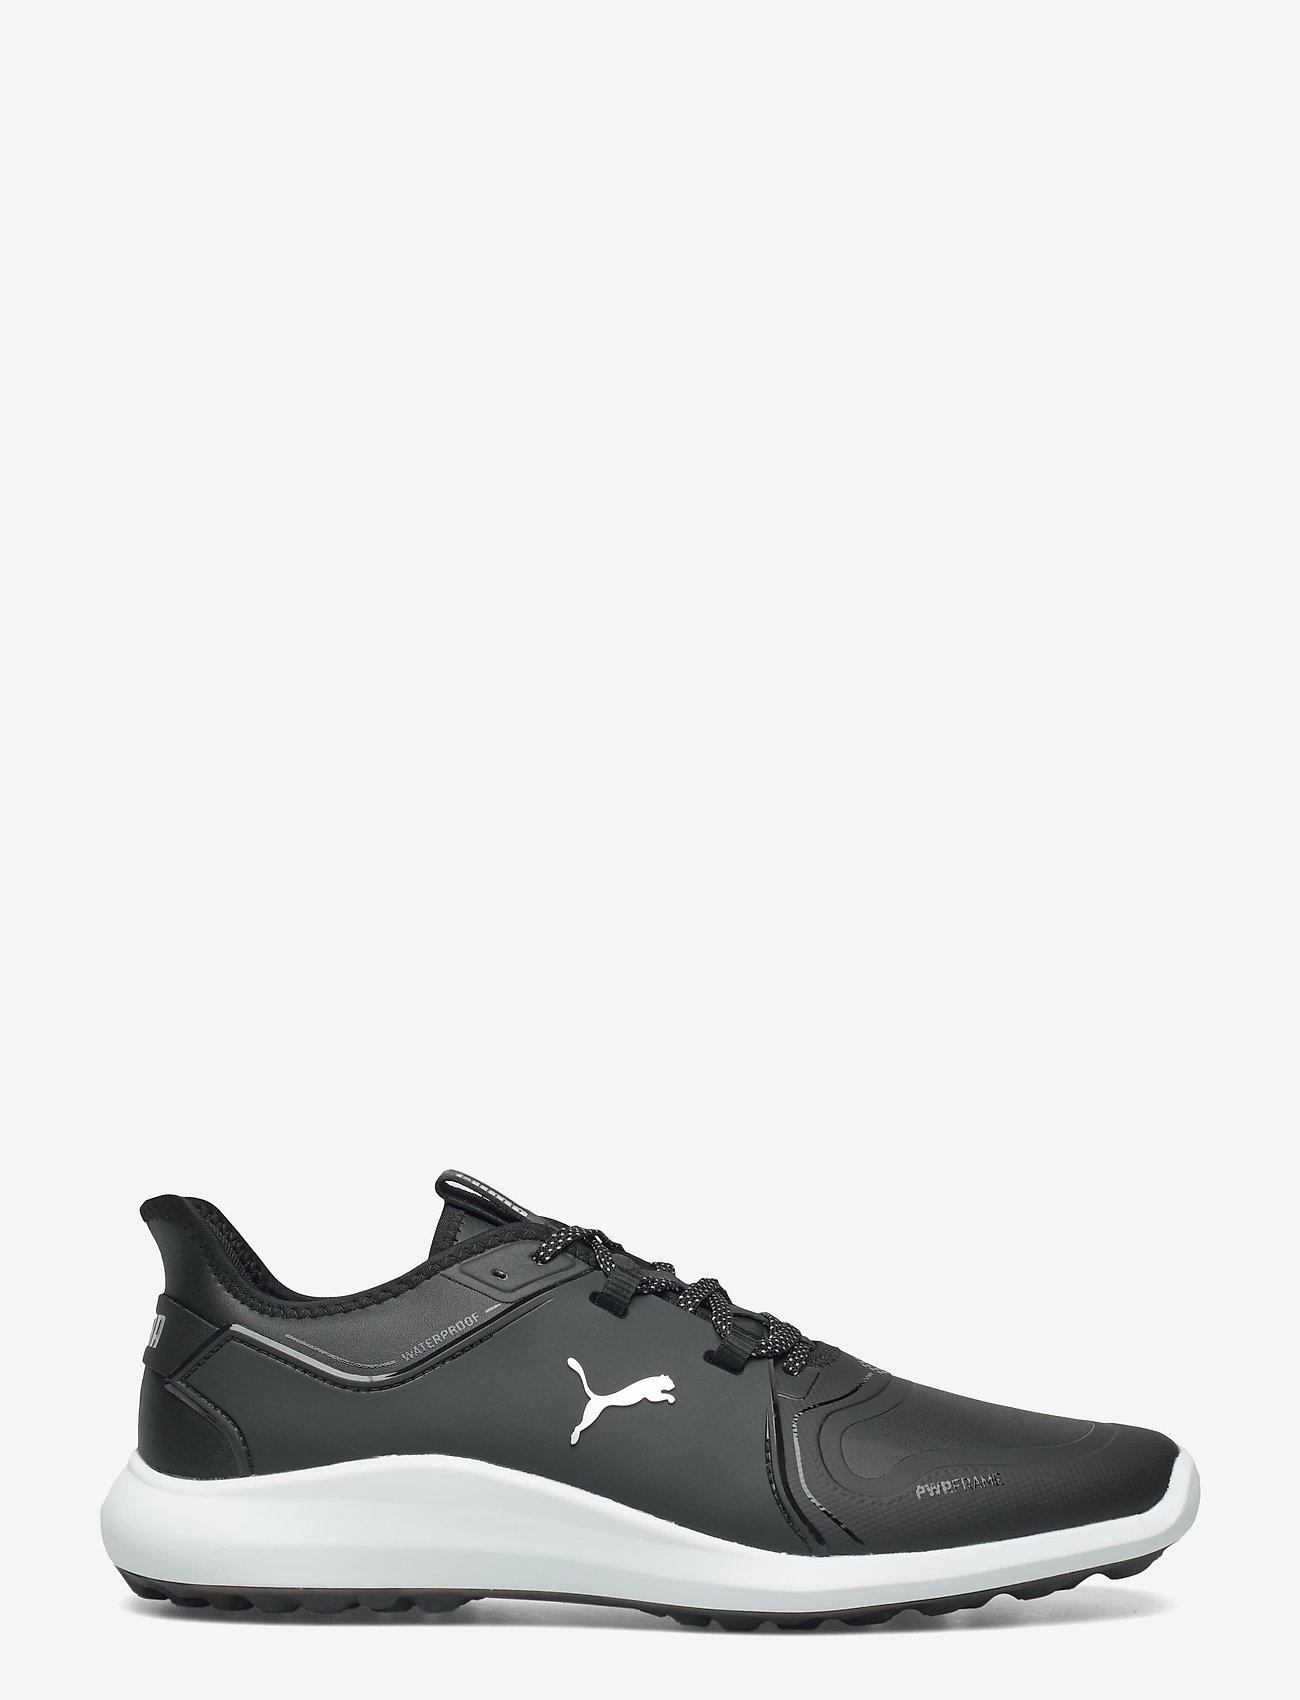 PUMA Golf - IGNITE FASTEN8 Pro - golf shoes - puma black-puma silver-puma black - 0